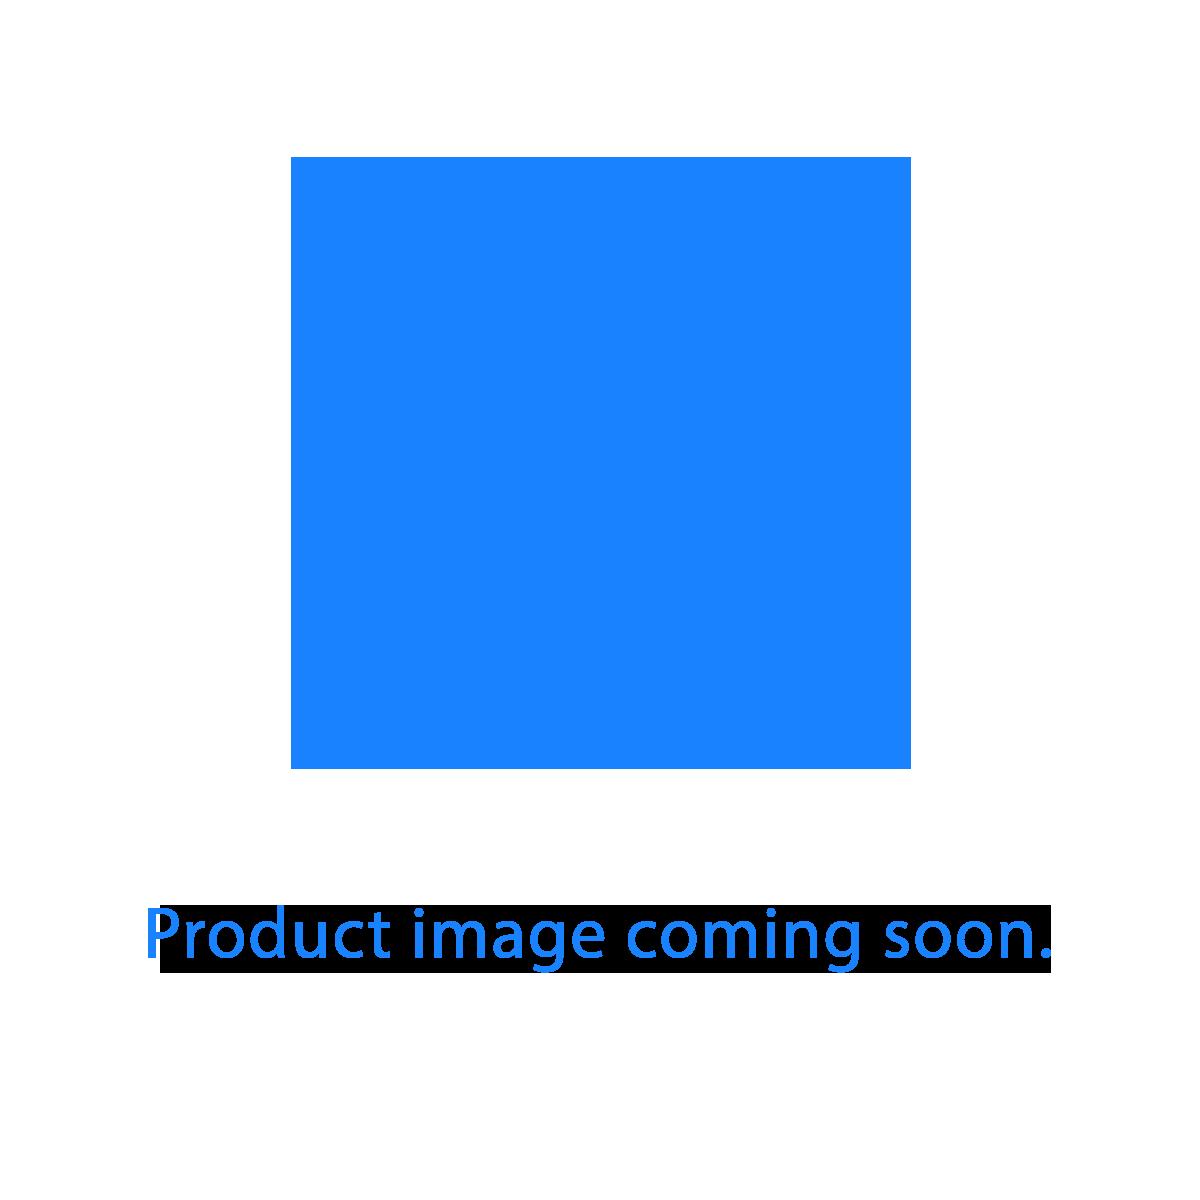 ASUS VivoBook S14 S433EQ-AM189T (Gaia Green)